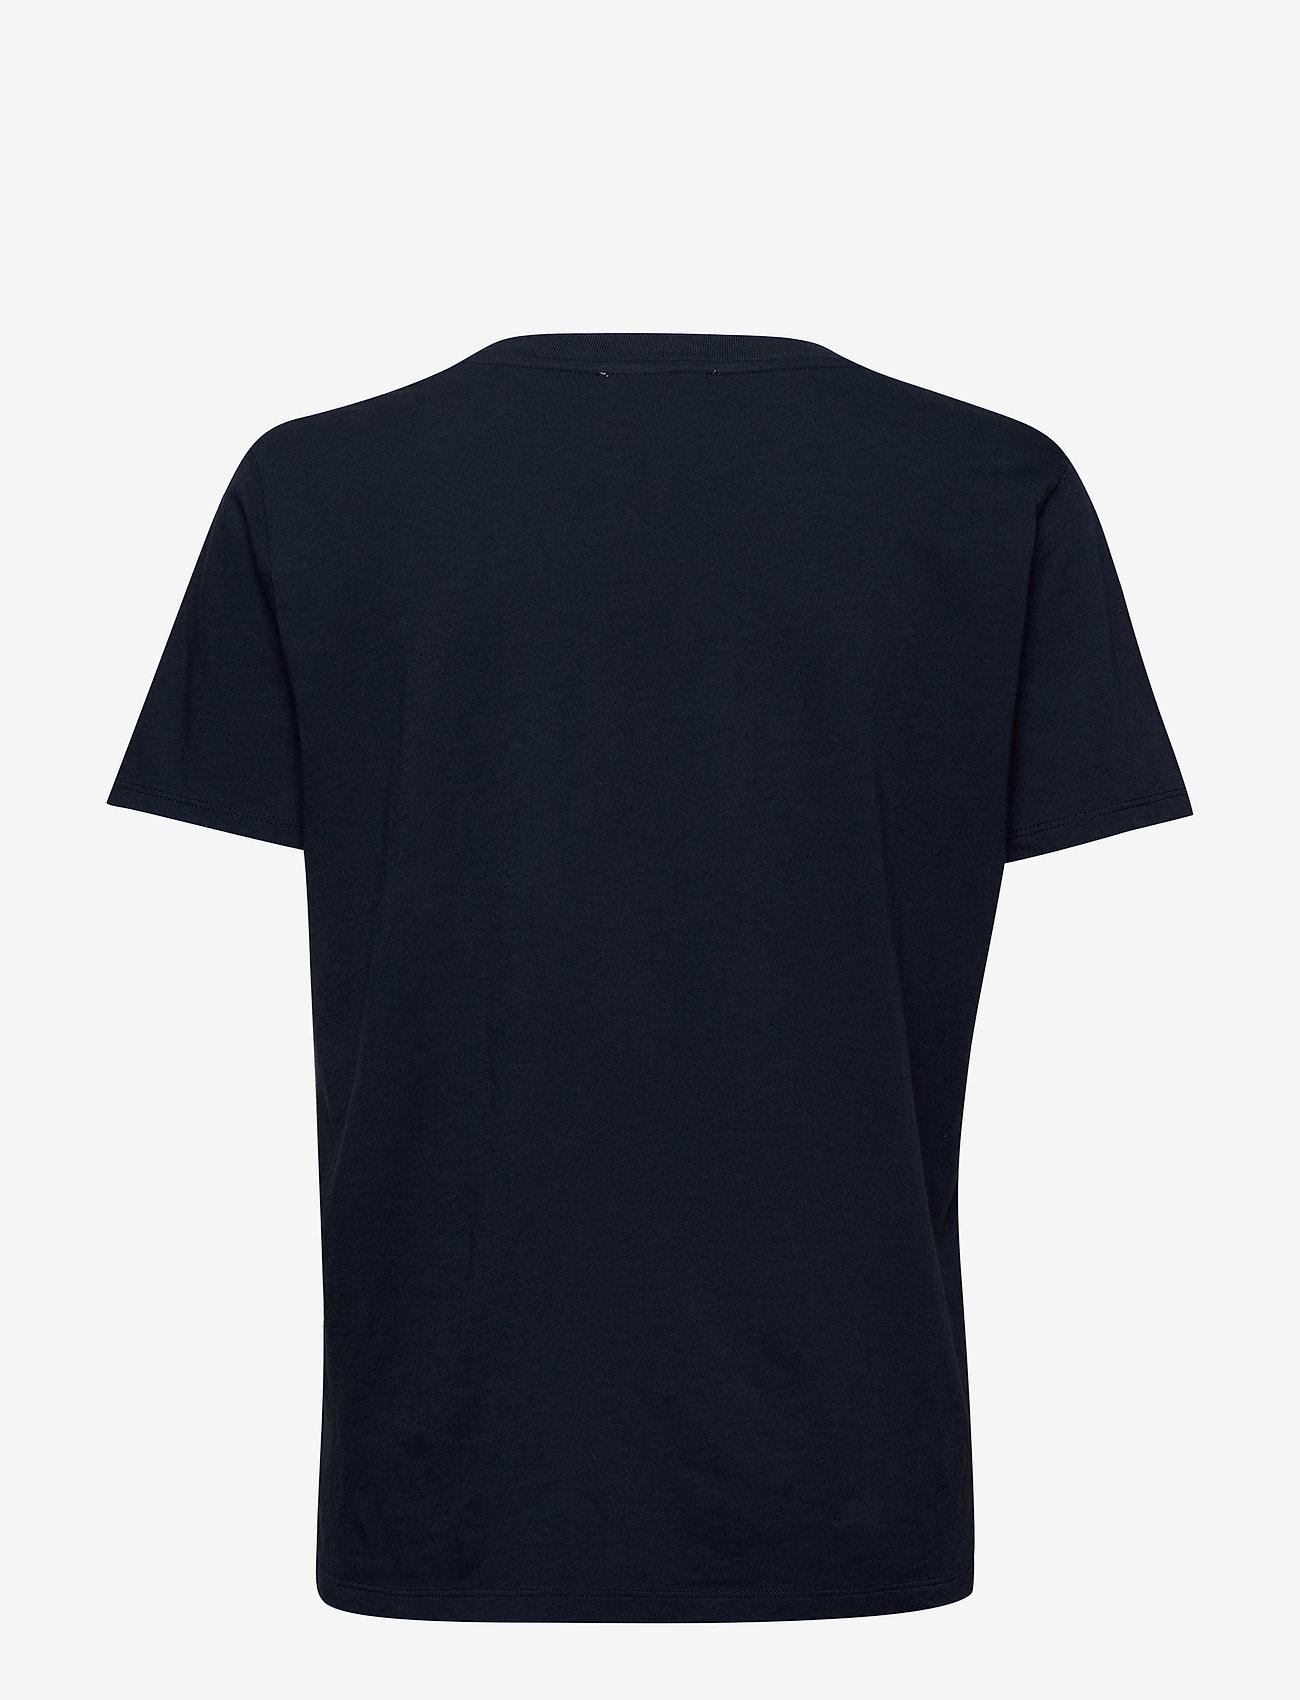 Single Organic Trenda P (Navy/white) (49 €) - Mads Nørgaard 1xH18